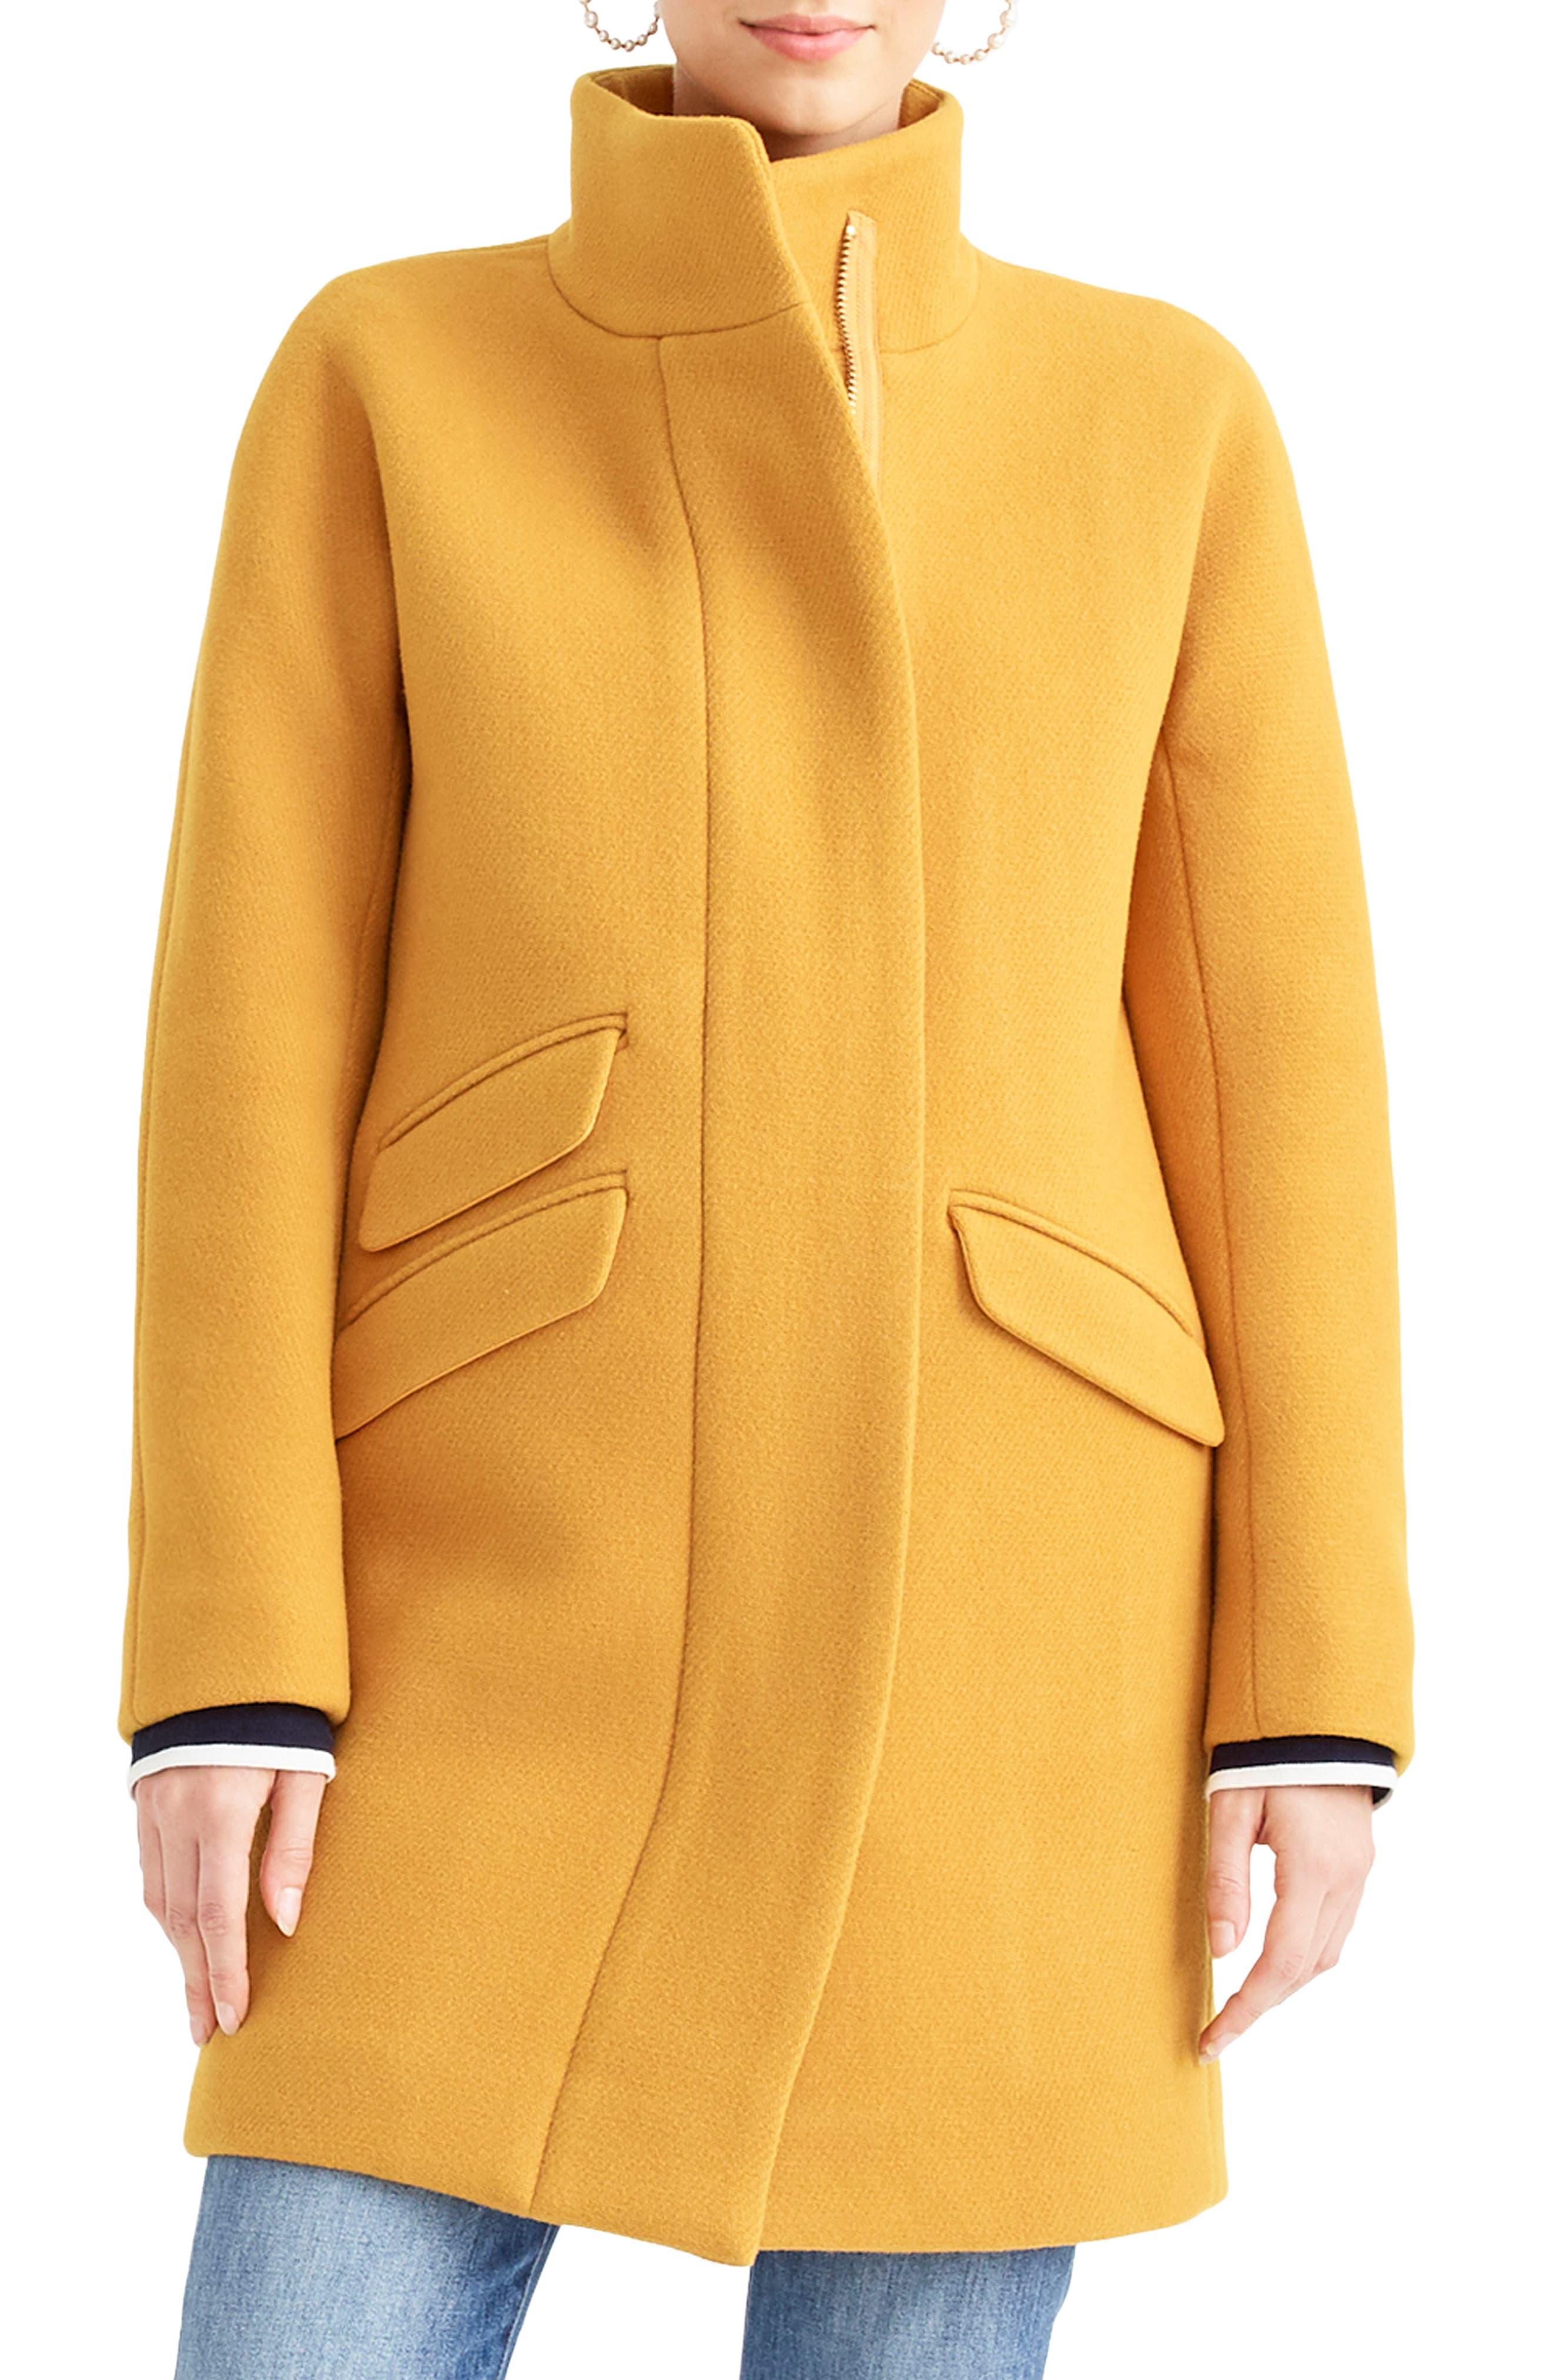 J.CREW, Stadium Cloth Cocoon Coat, Main thumbnail 1, color, 800